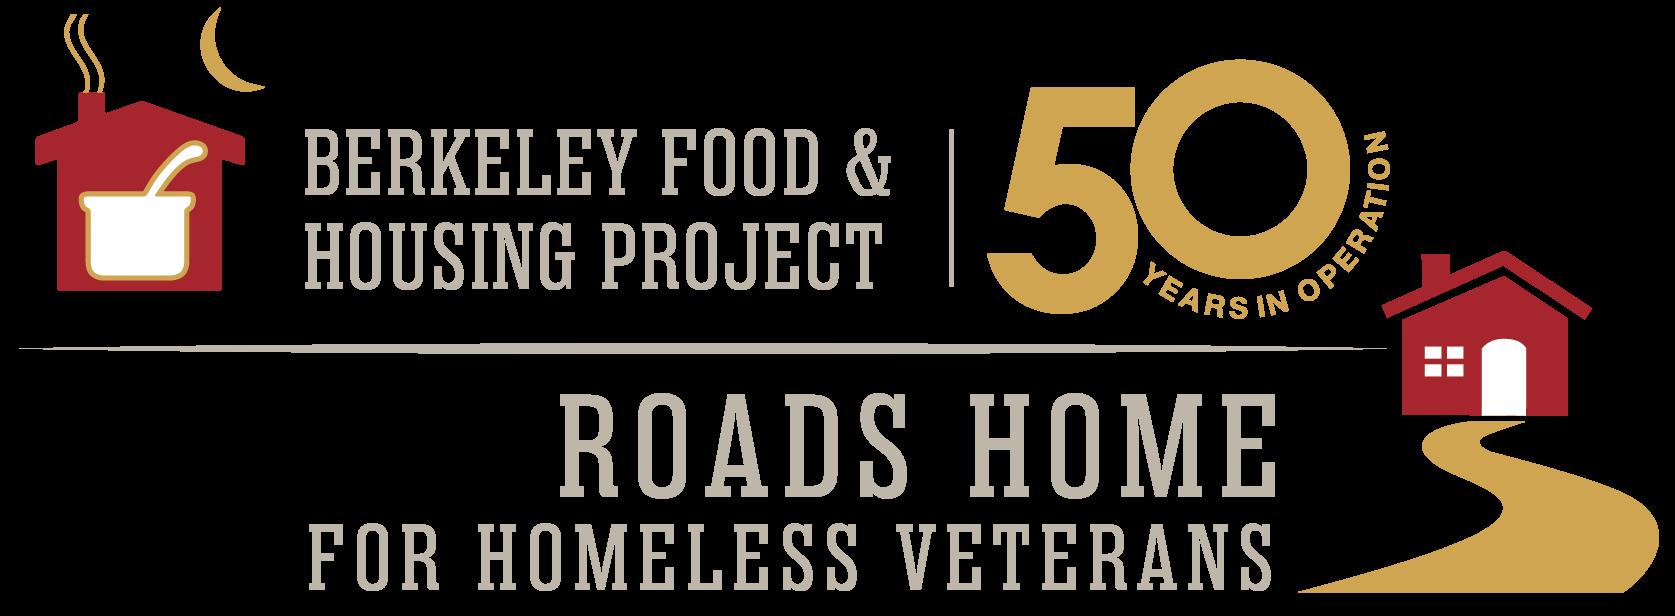 Berkeley Food & Housing Project Logo